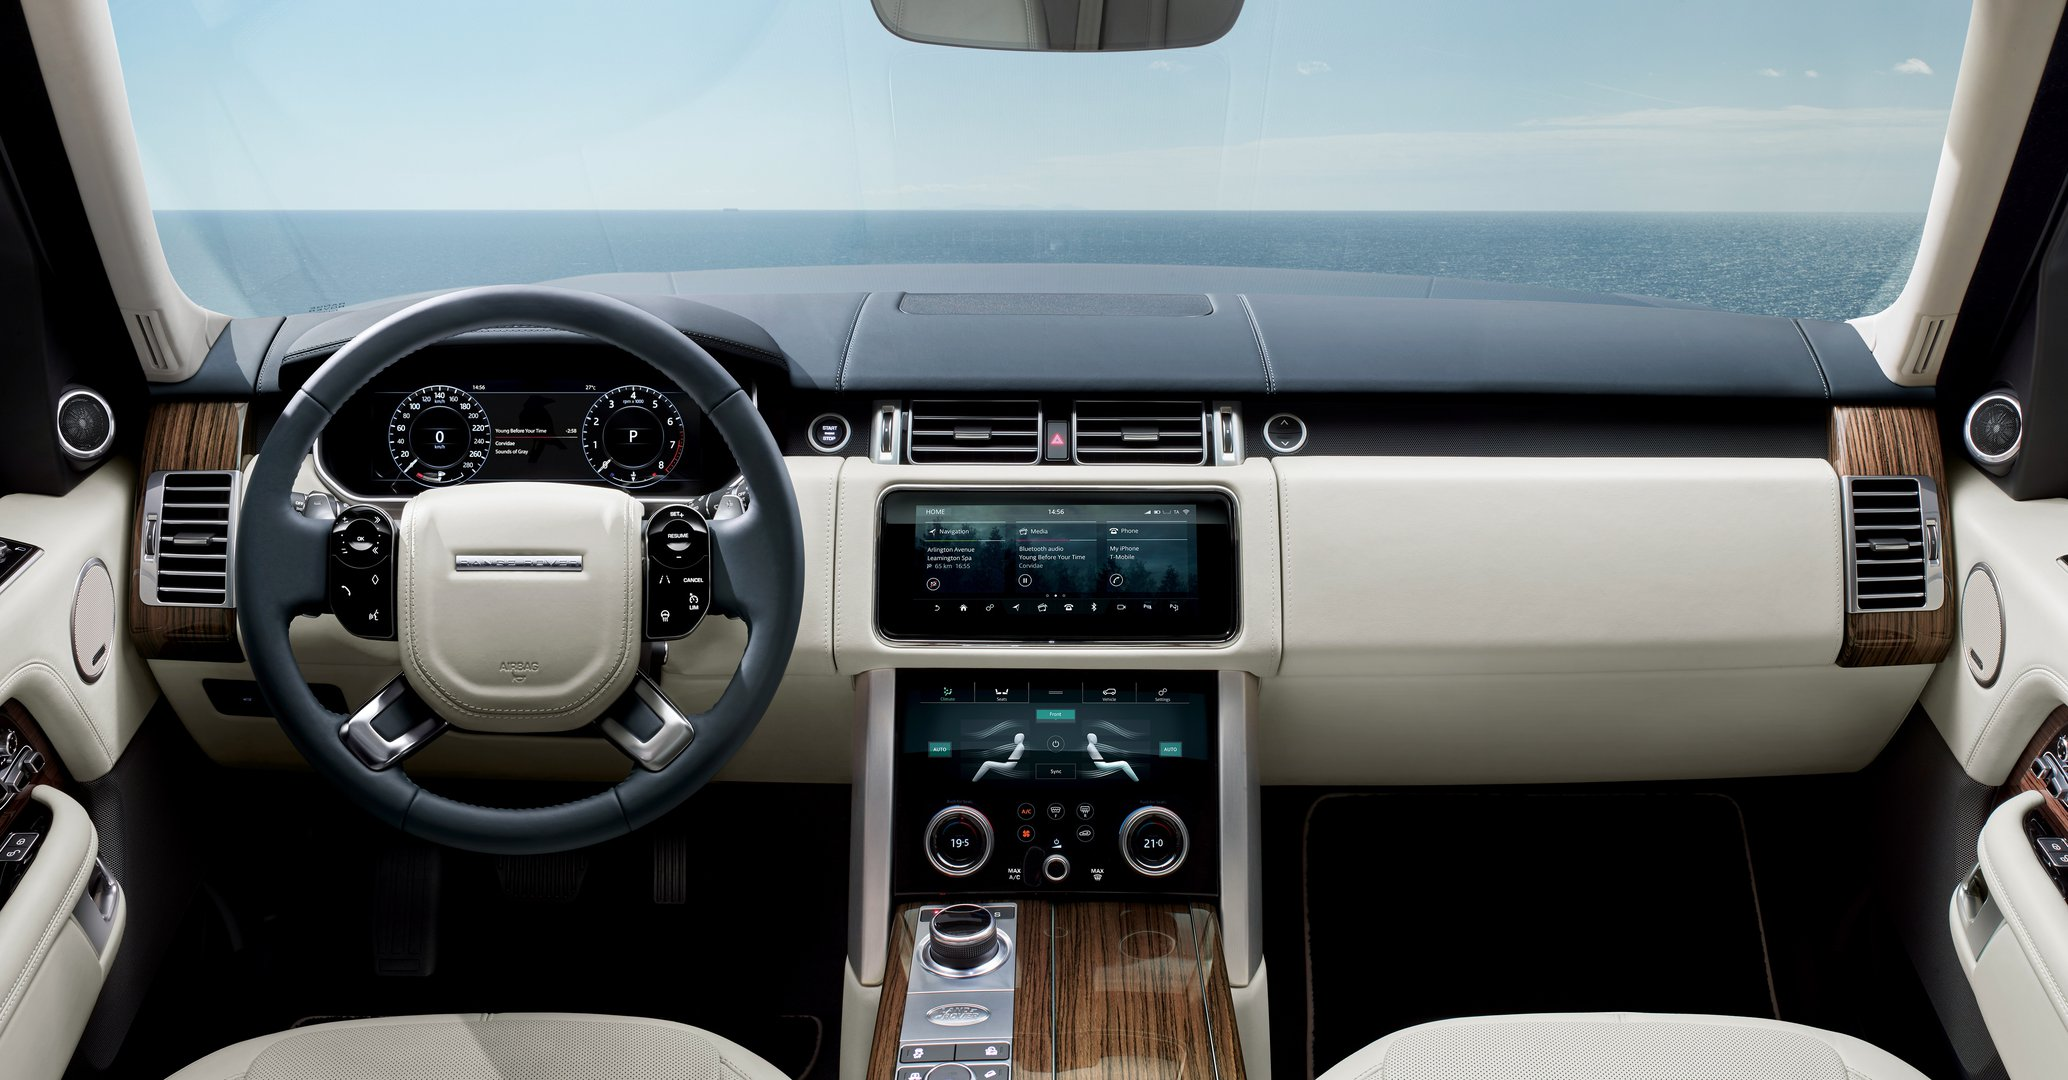 Range Rover also as plug in hybrid Driving Plugin magazine